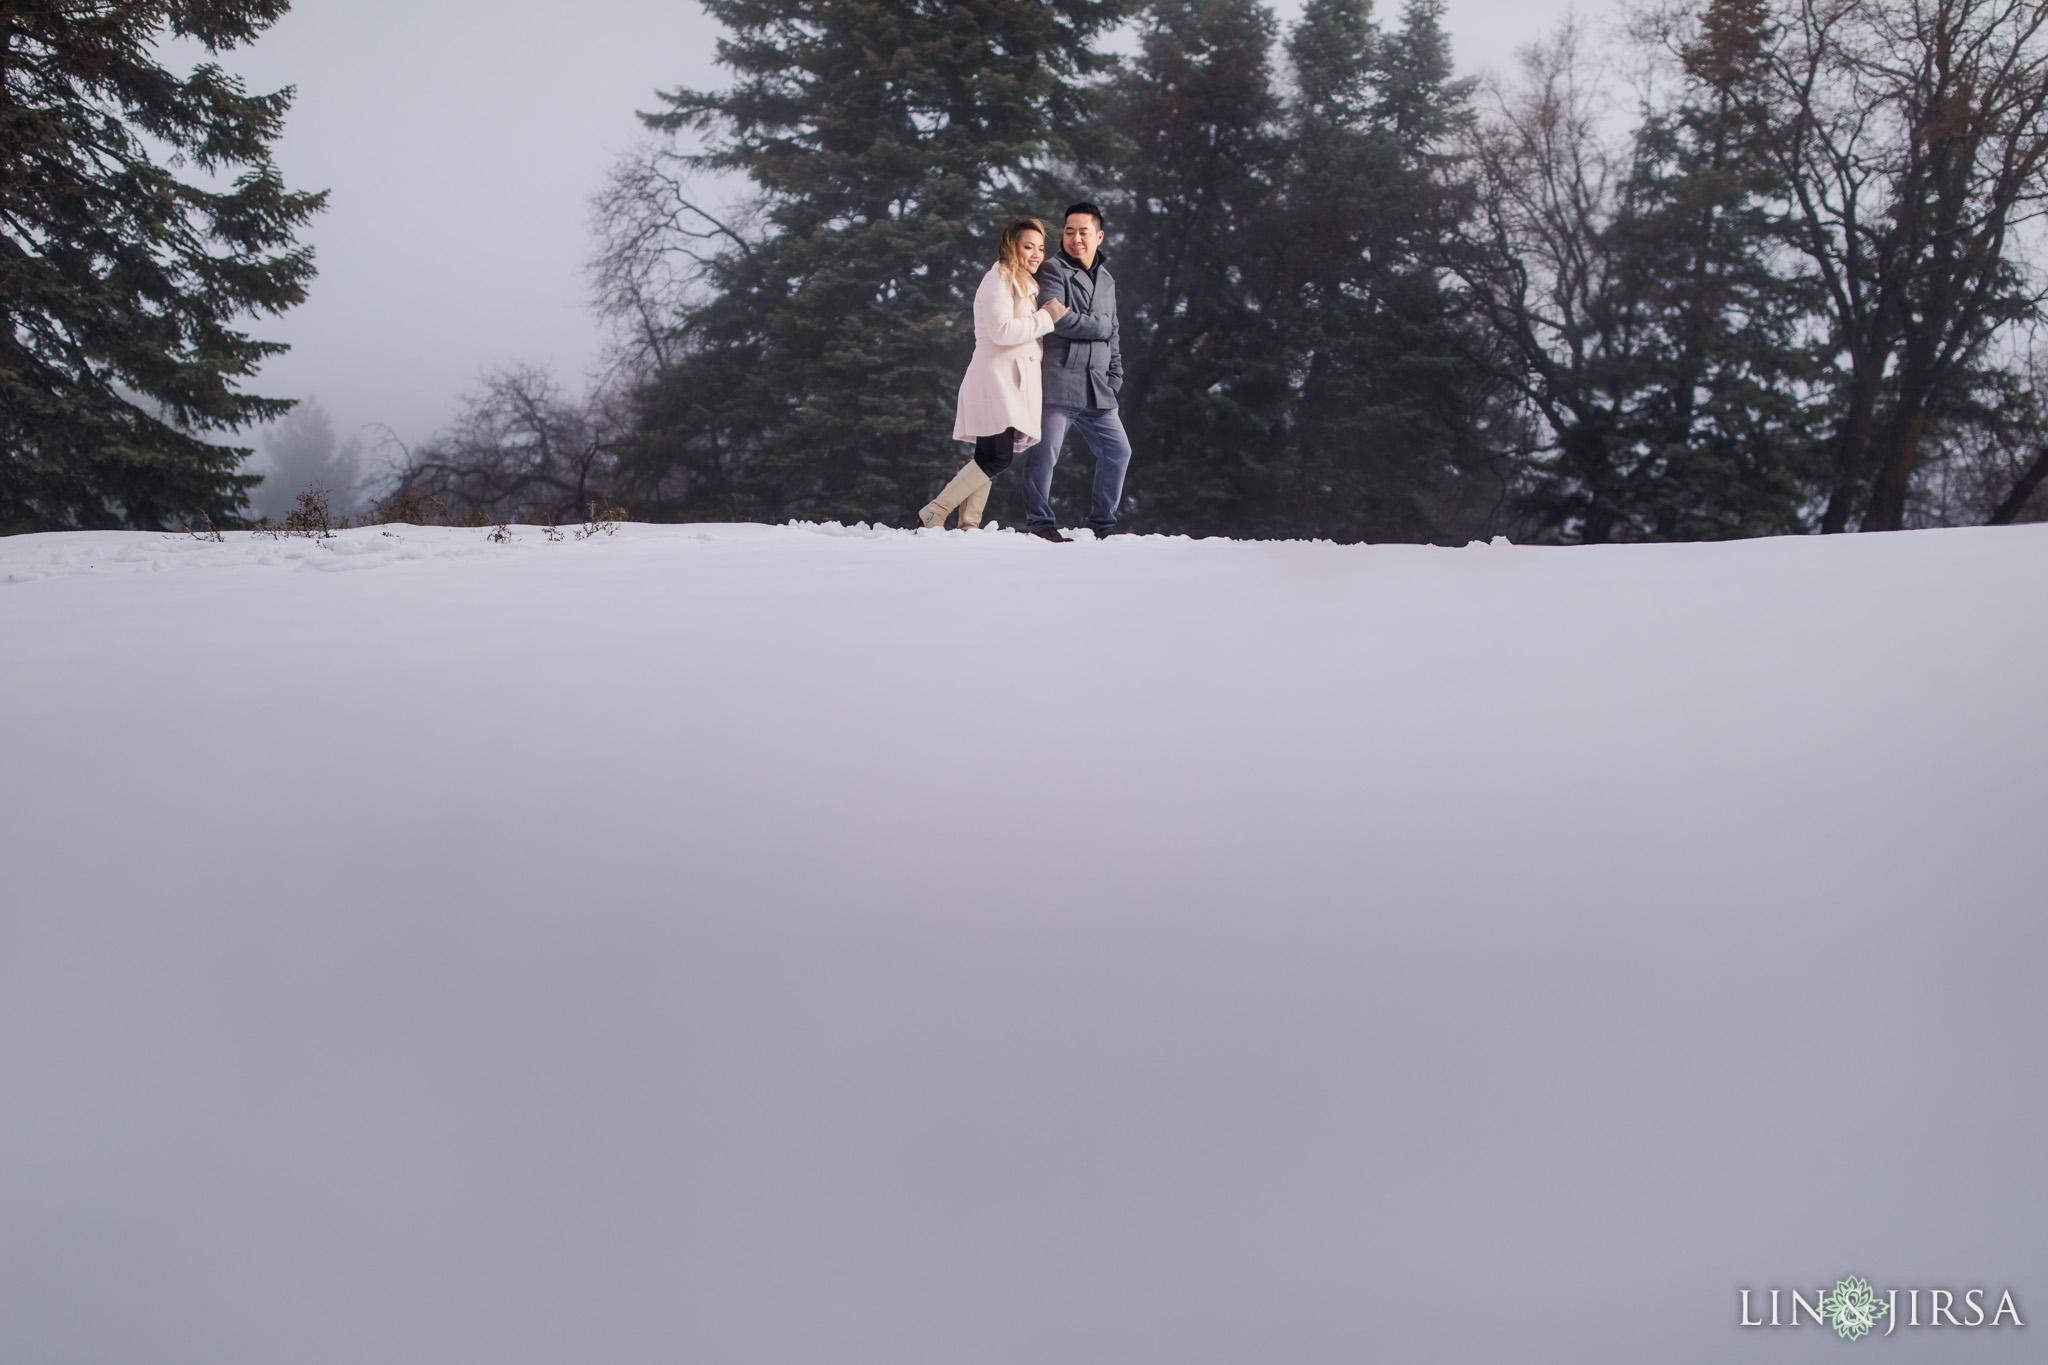 09 Big Bear Lake Snowy Engagement Photography